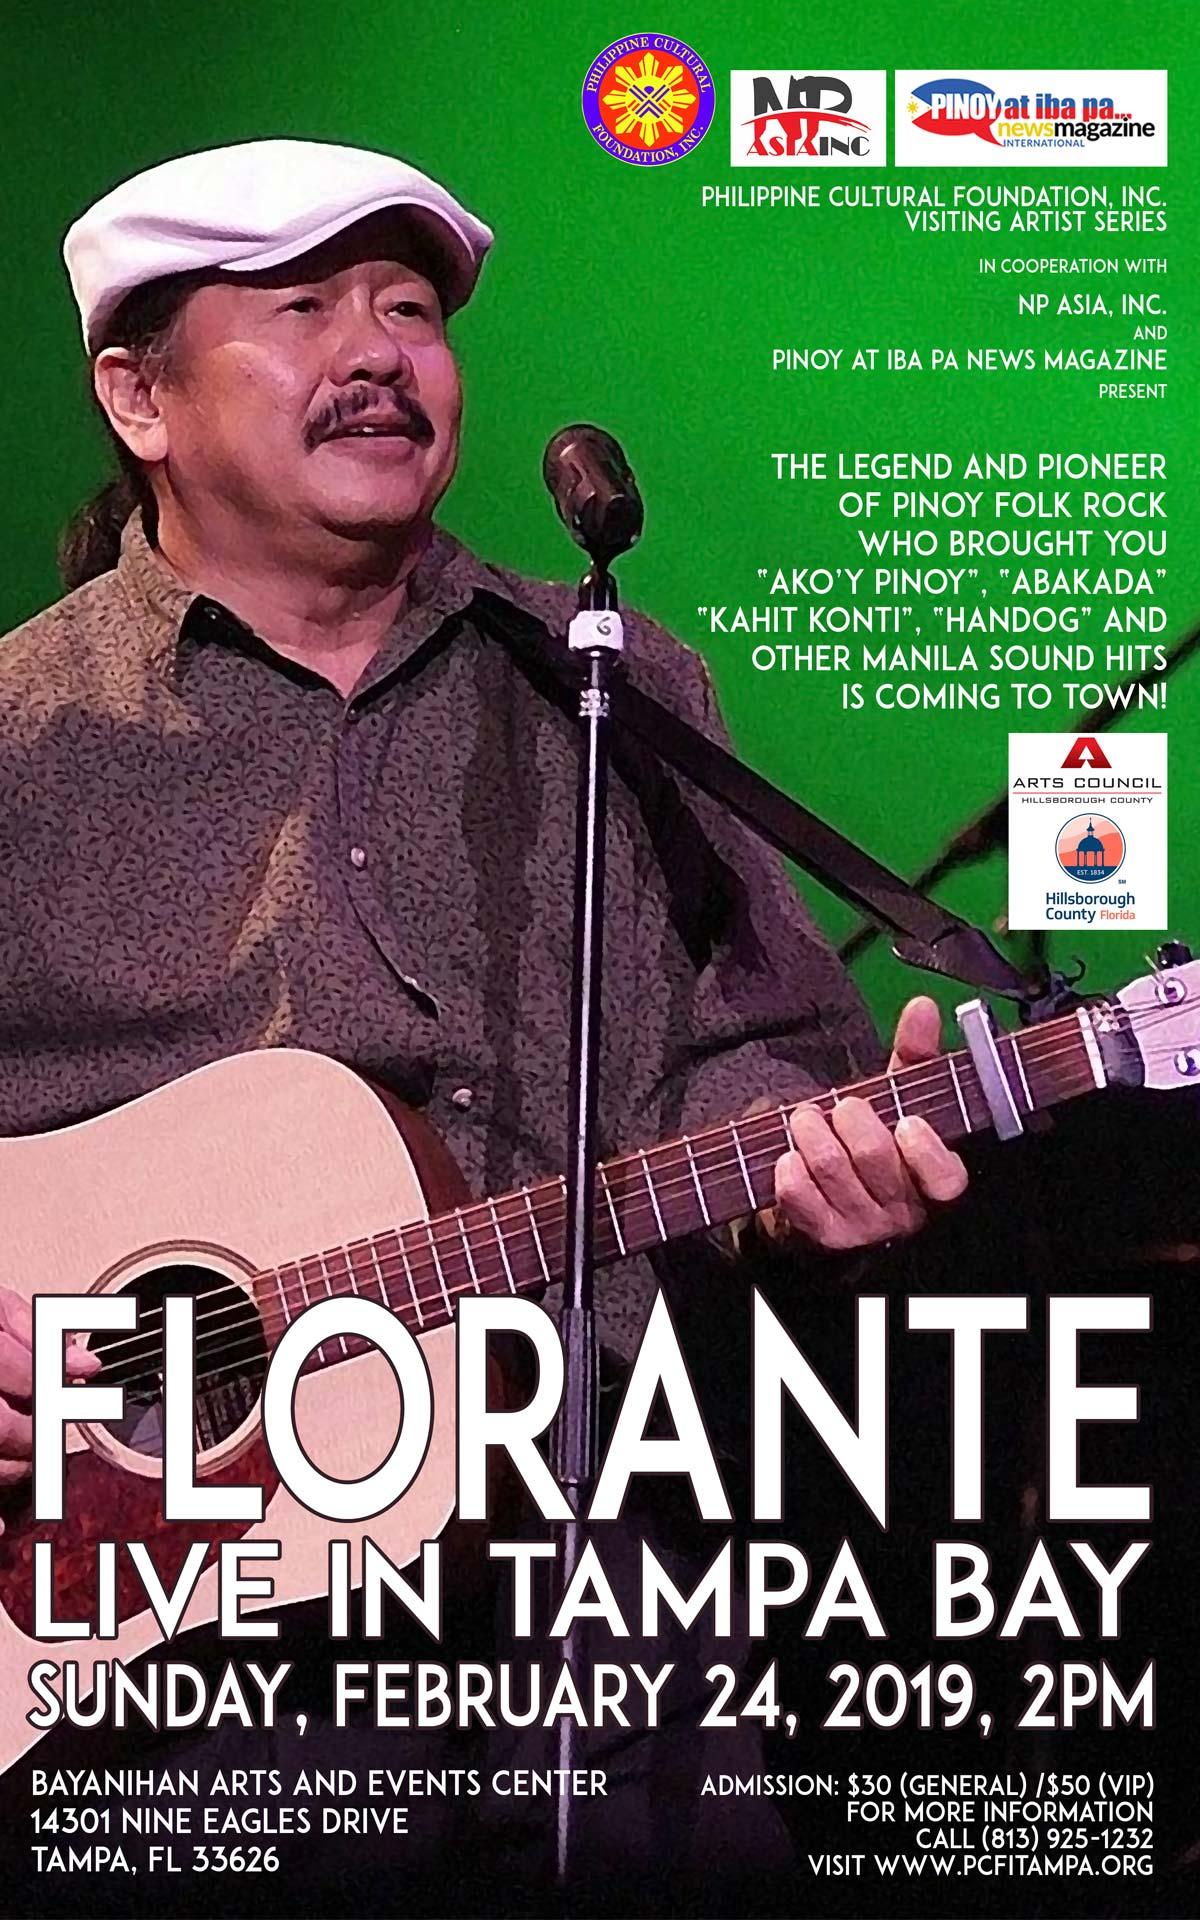 Florante Live in Tampa Bay